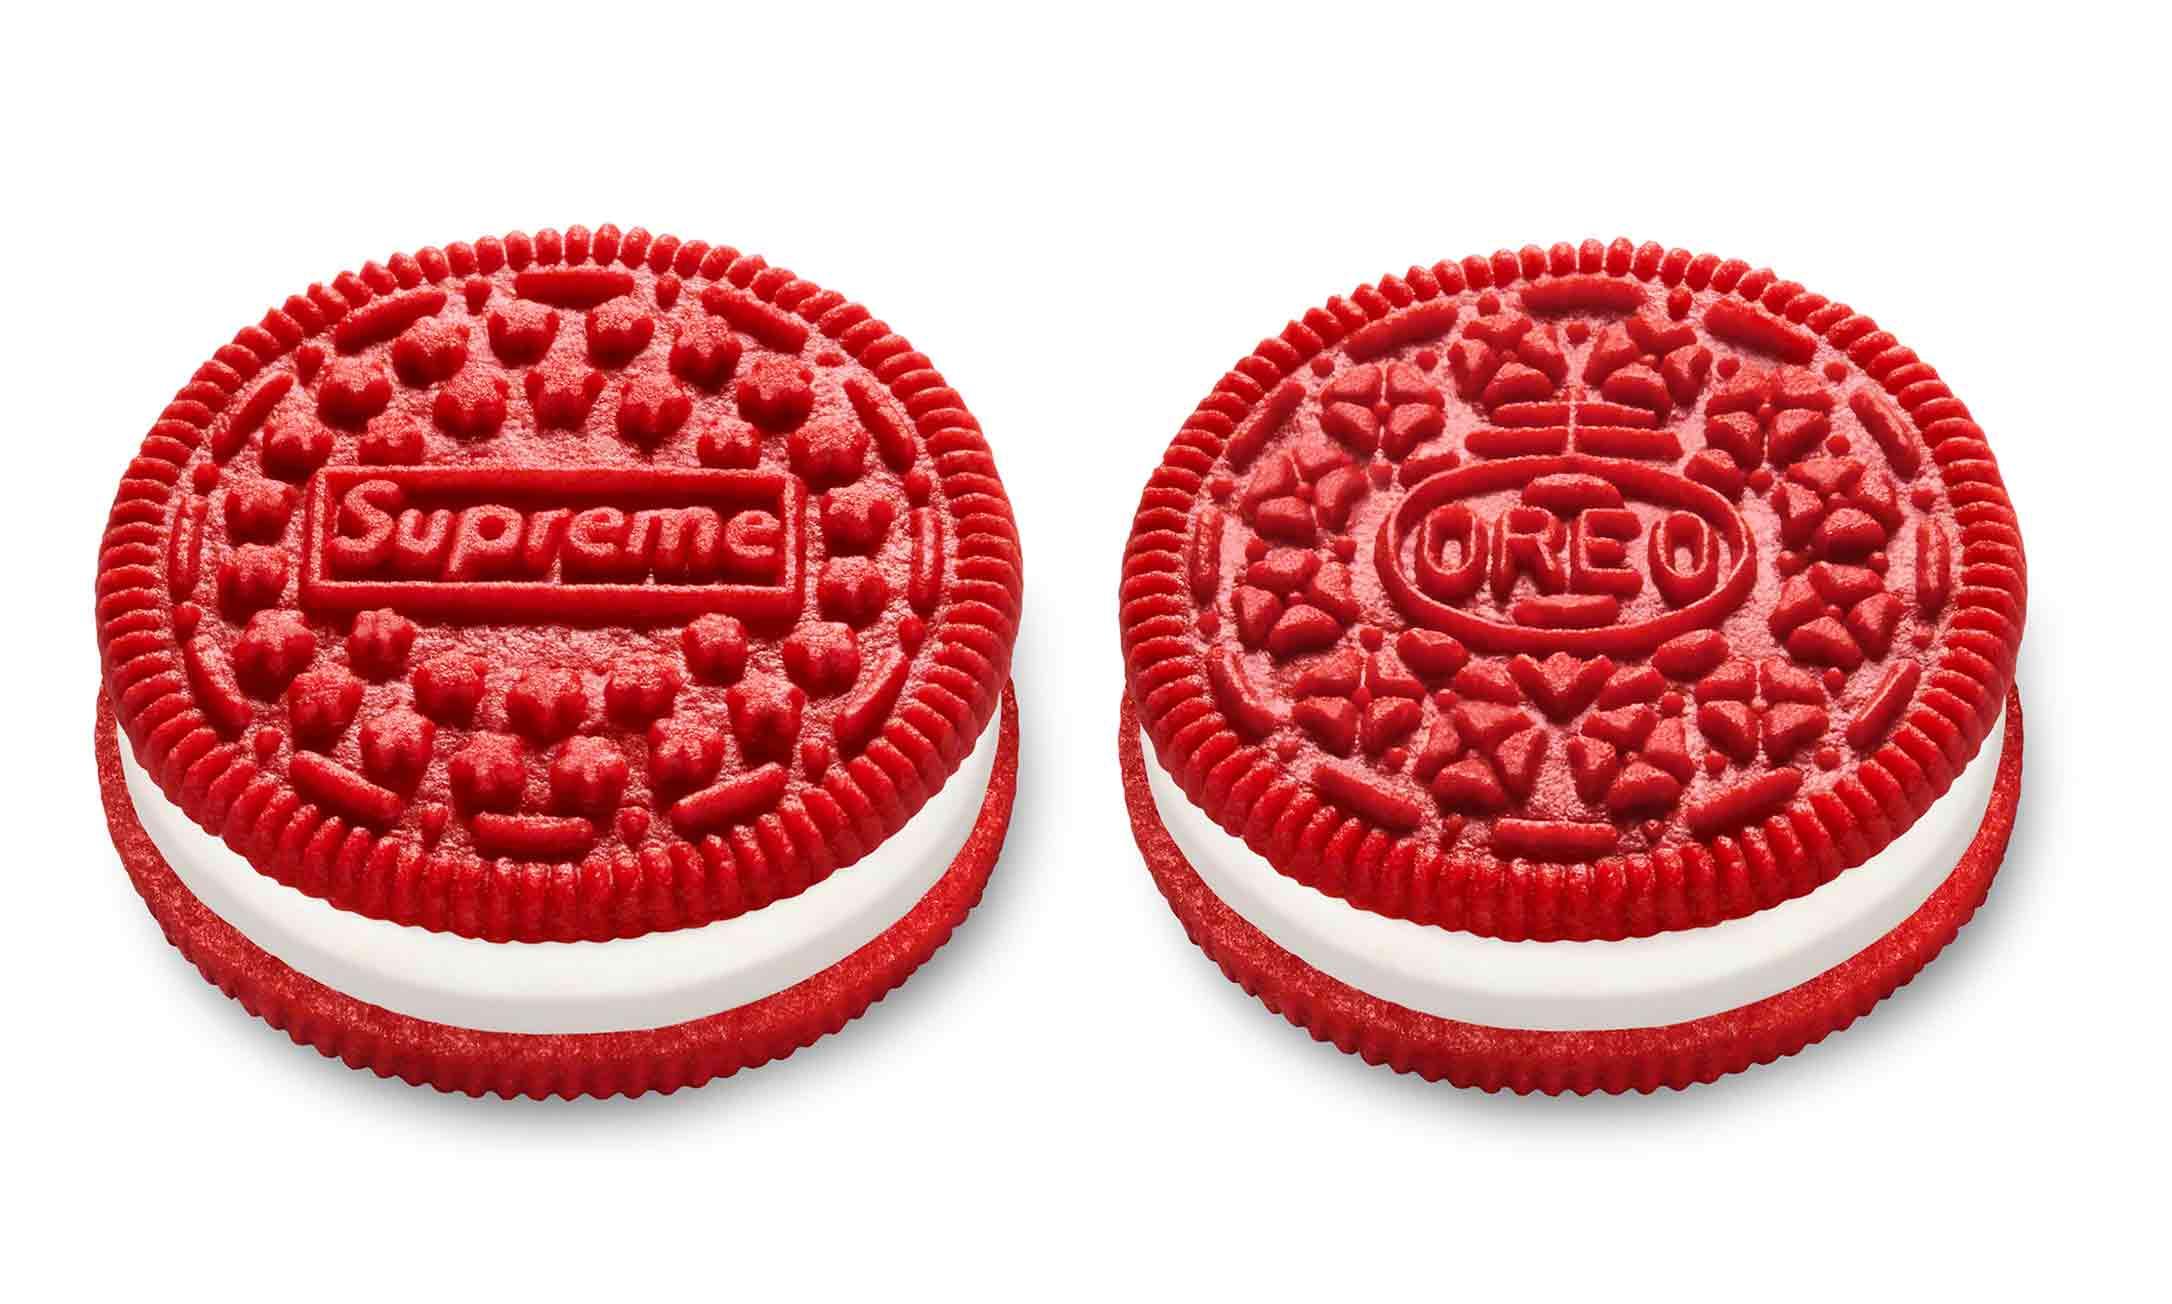 Supreme x 奥利奥饼干将于本周开售